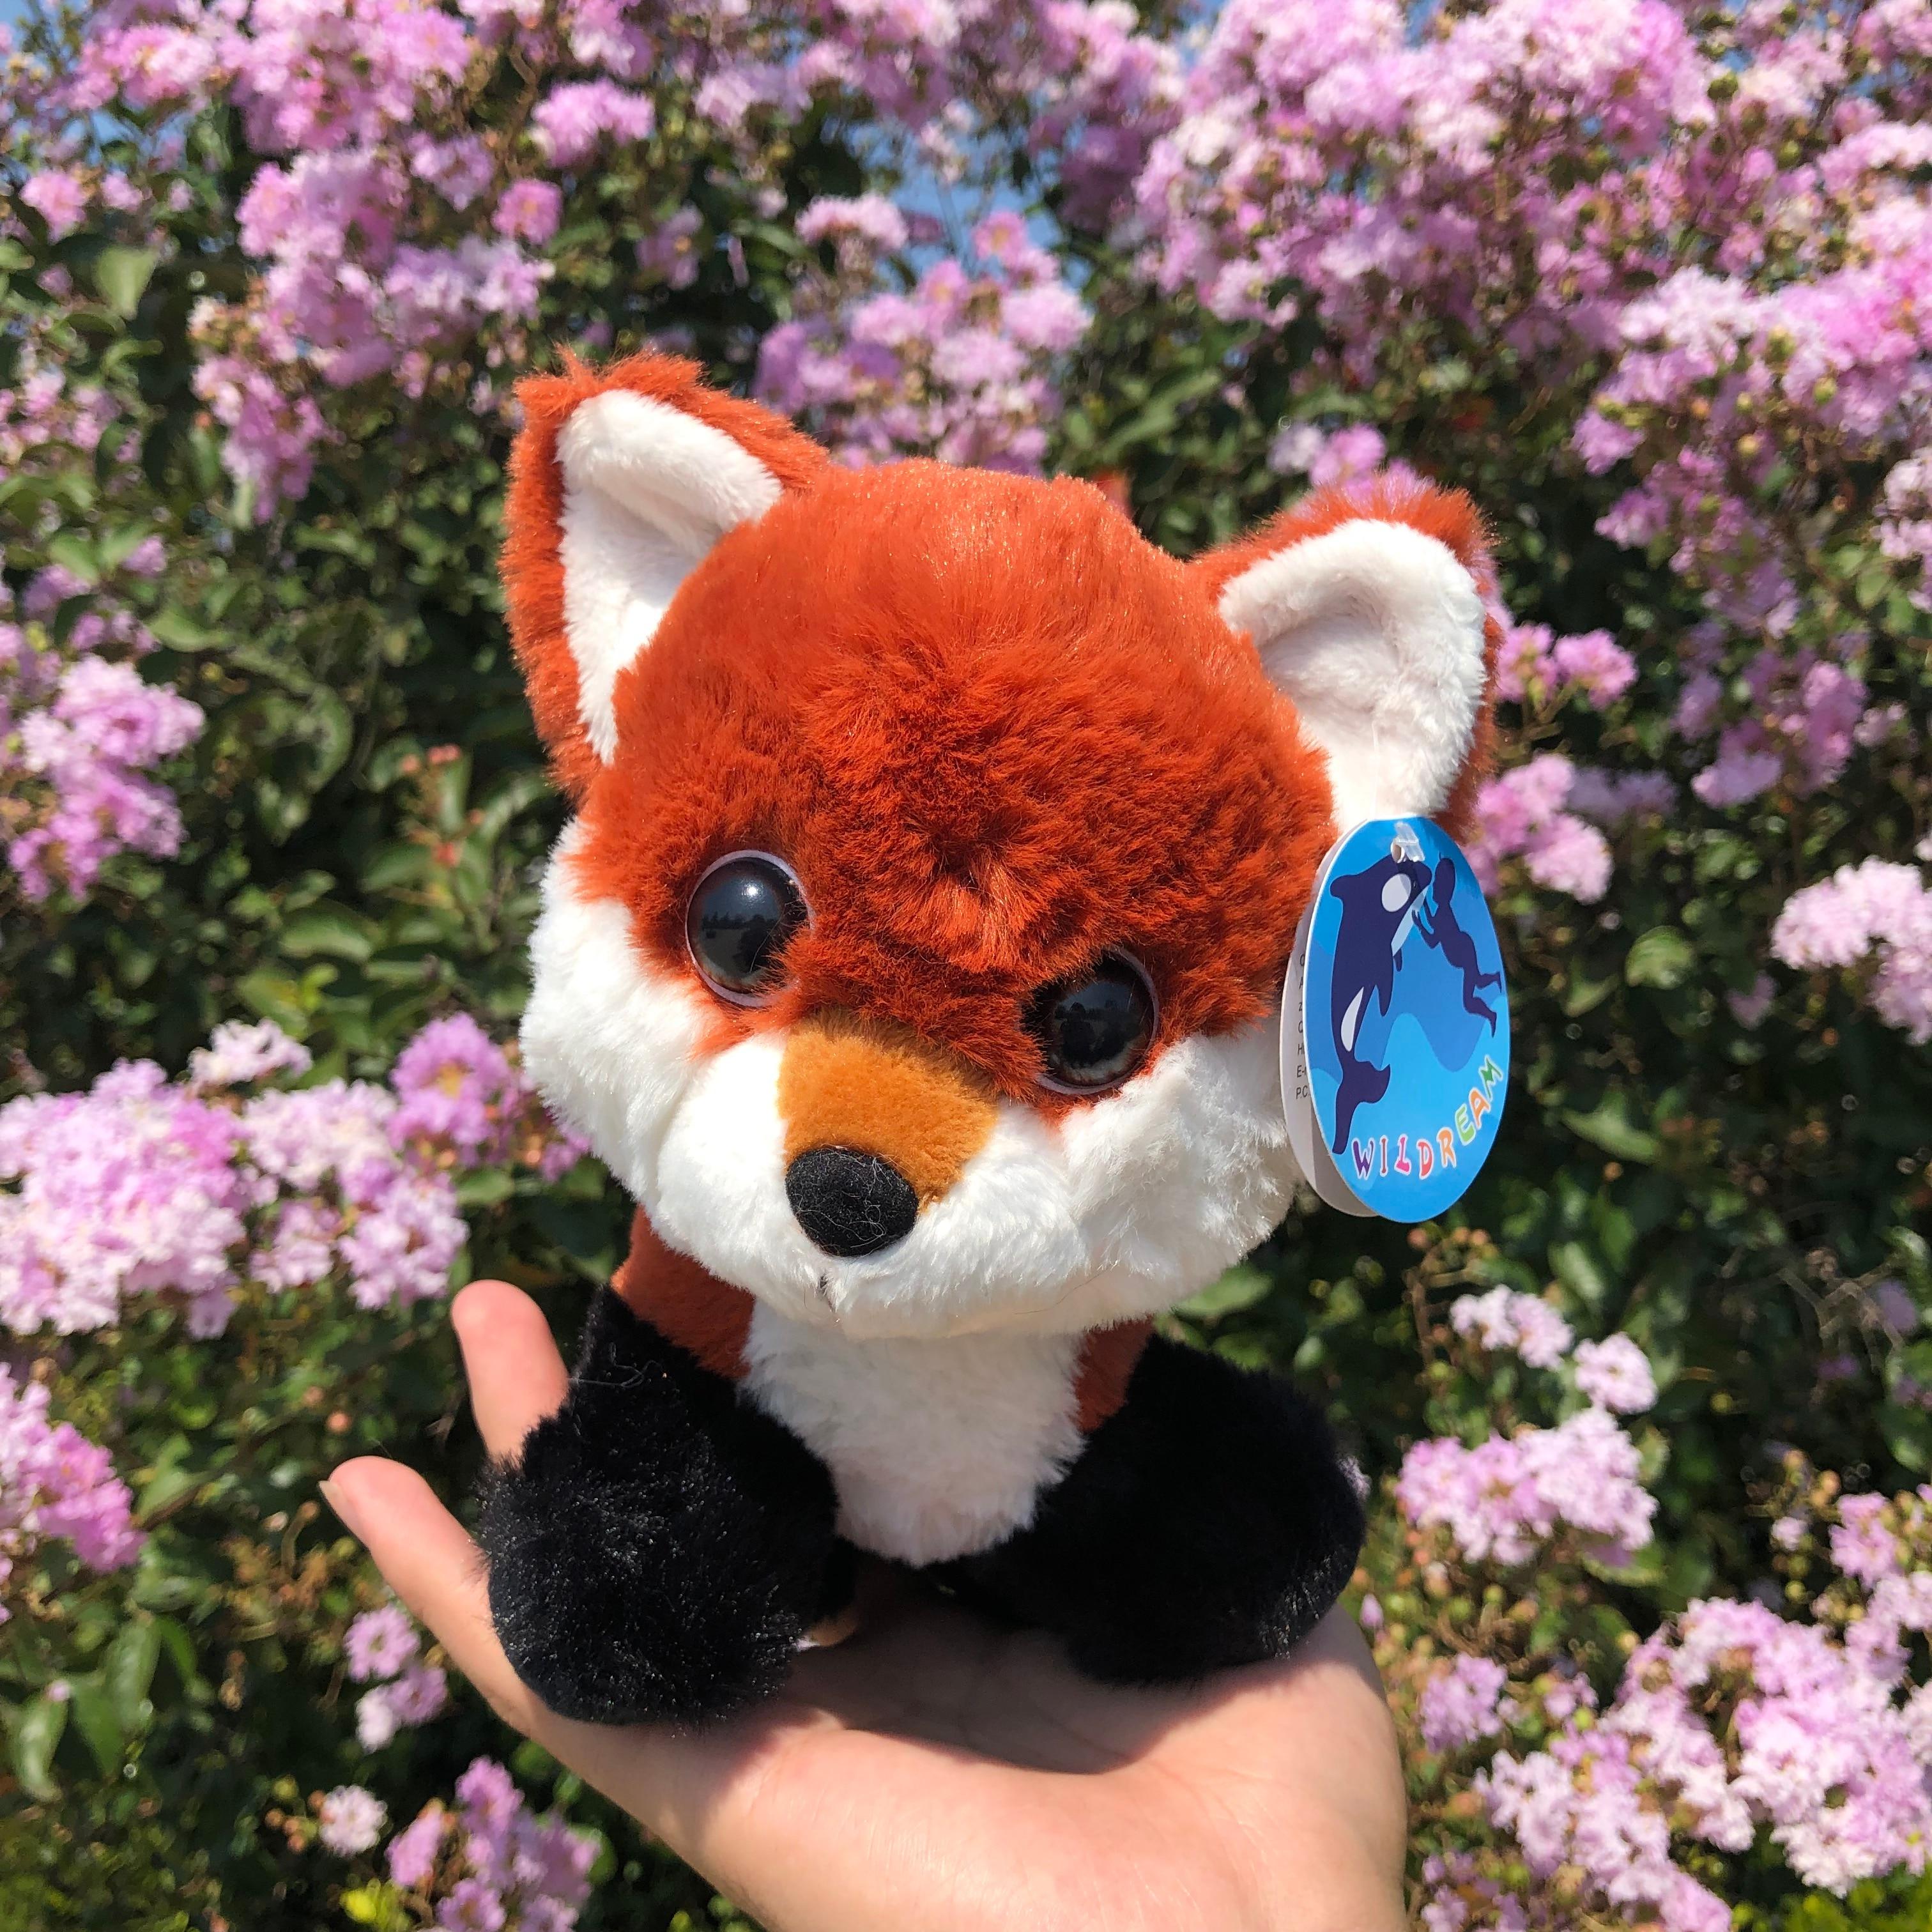 18cm New Arrive Lovely Stuffed Plush Long Tail Fox Toys Dolls Kawaii Plush Toy Children Friends Gifts(China)